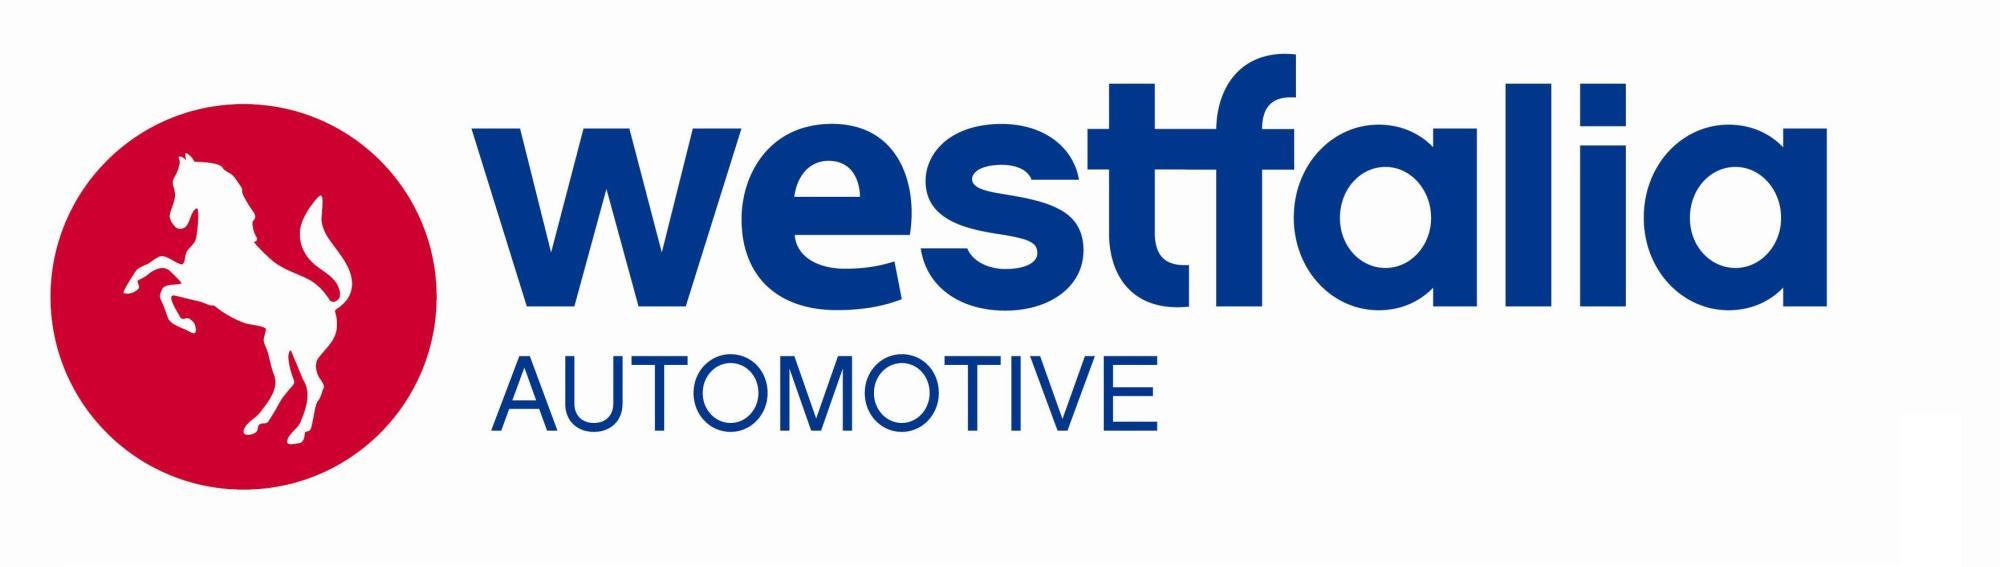 hight resolution of witter logo westfalia logo